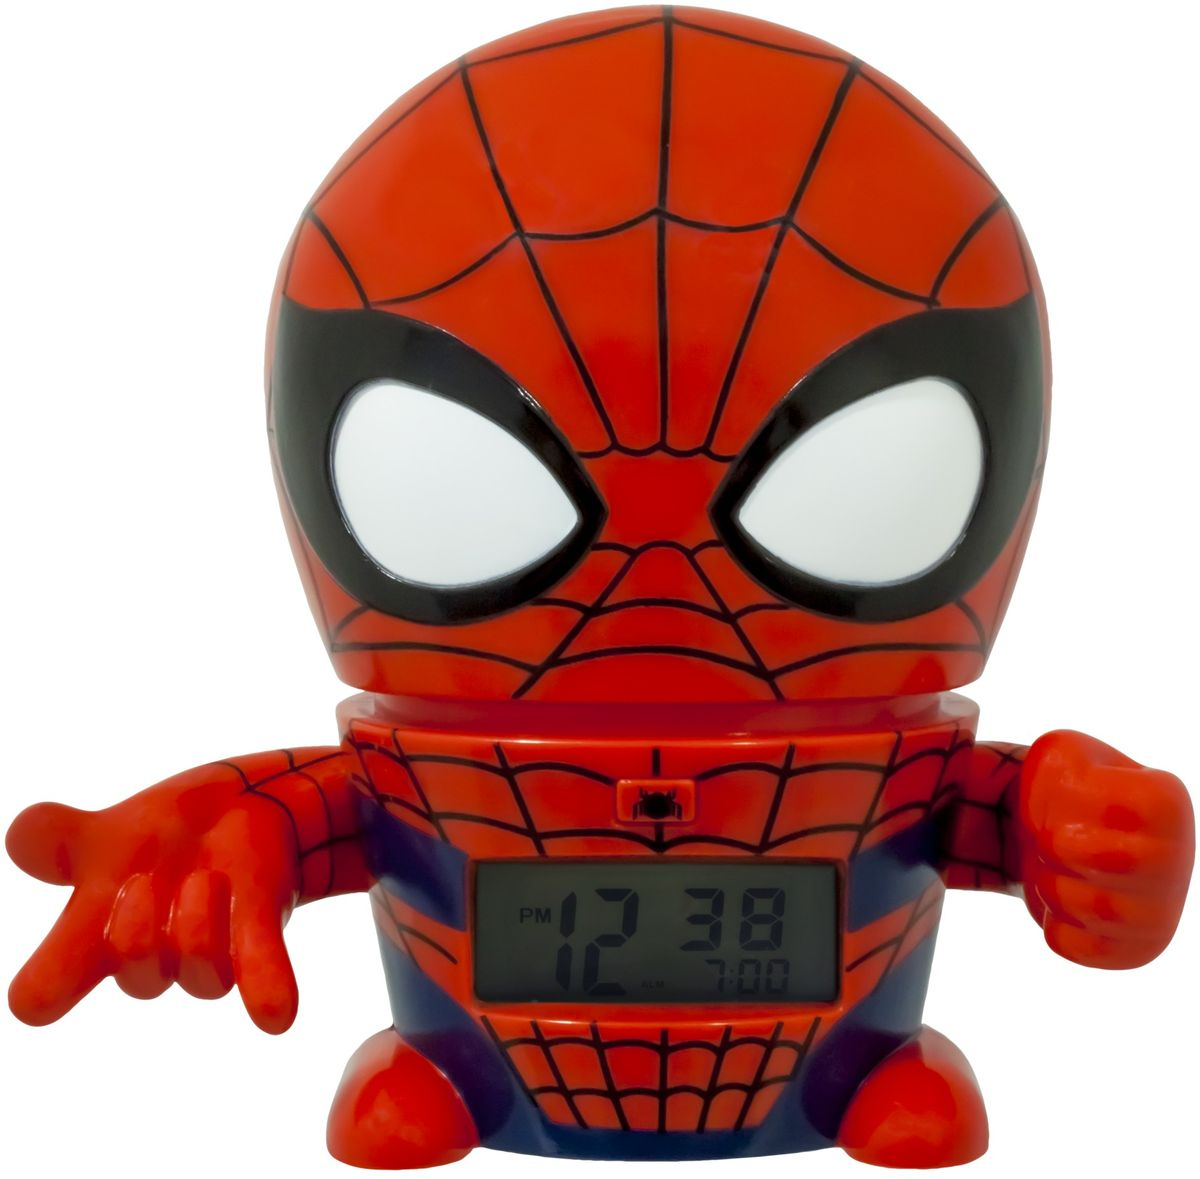 Marvel Spider-Man Будильник BulbBotz Spider-Man все цены